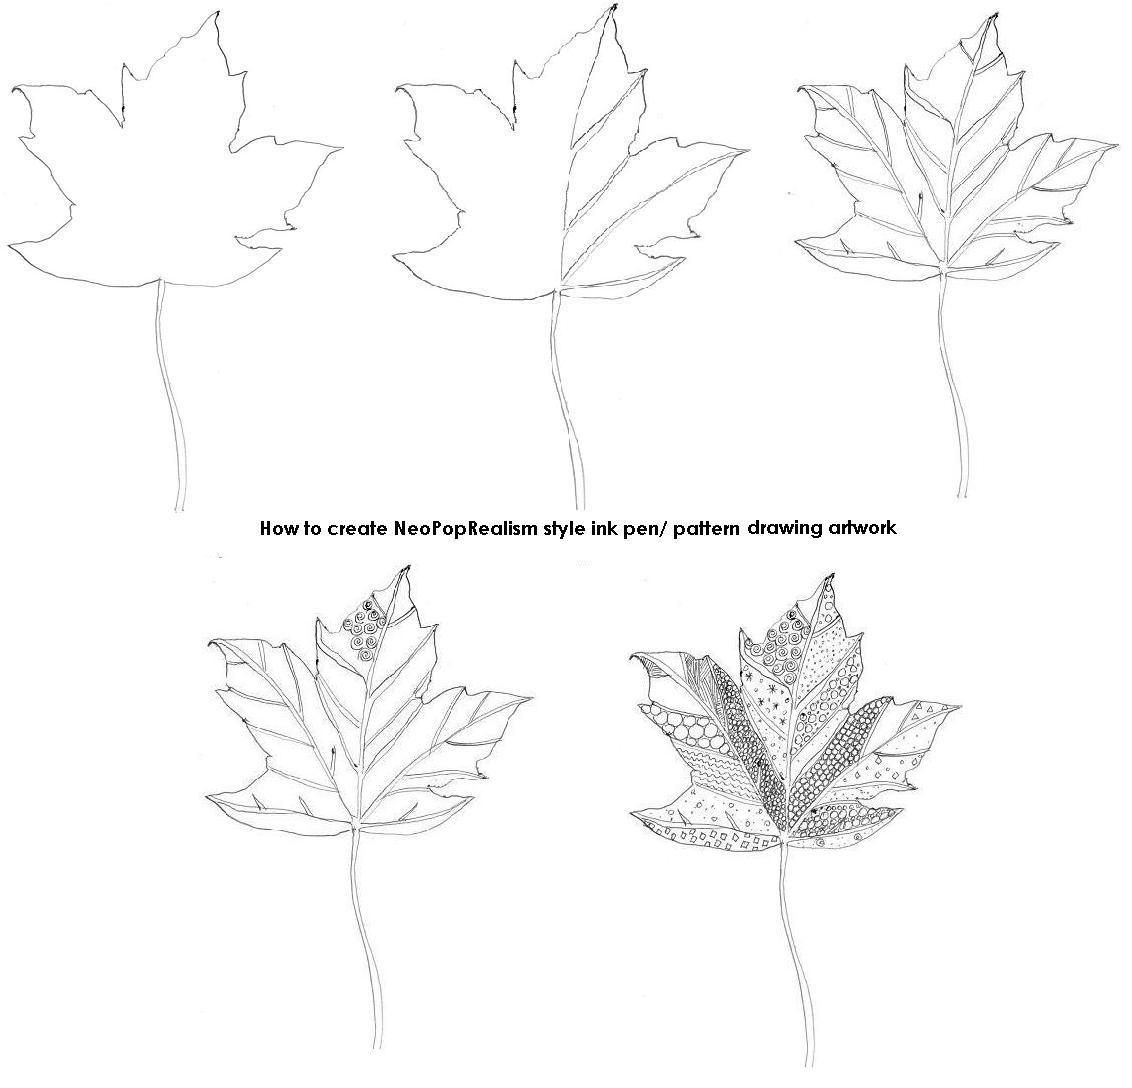 how to draw a fern leaf step by step